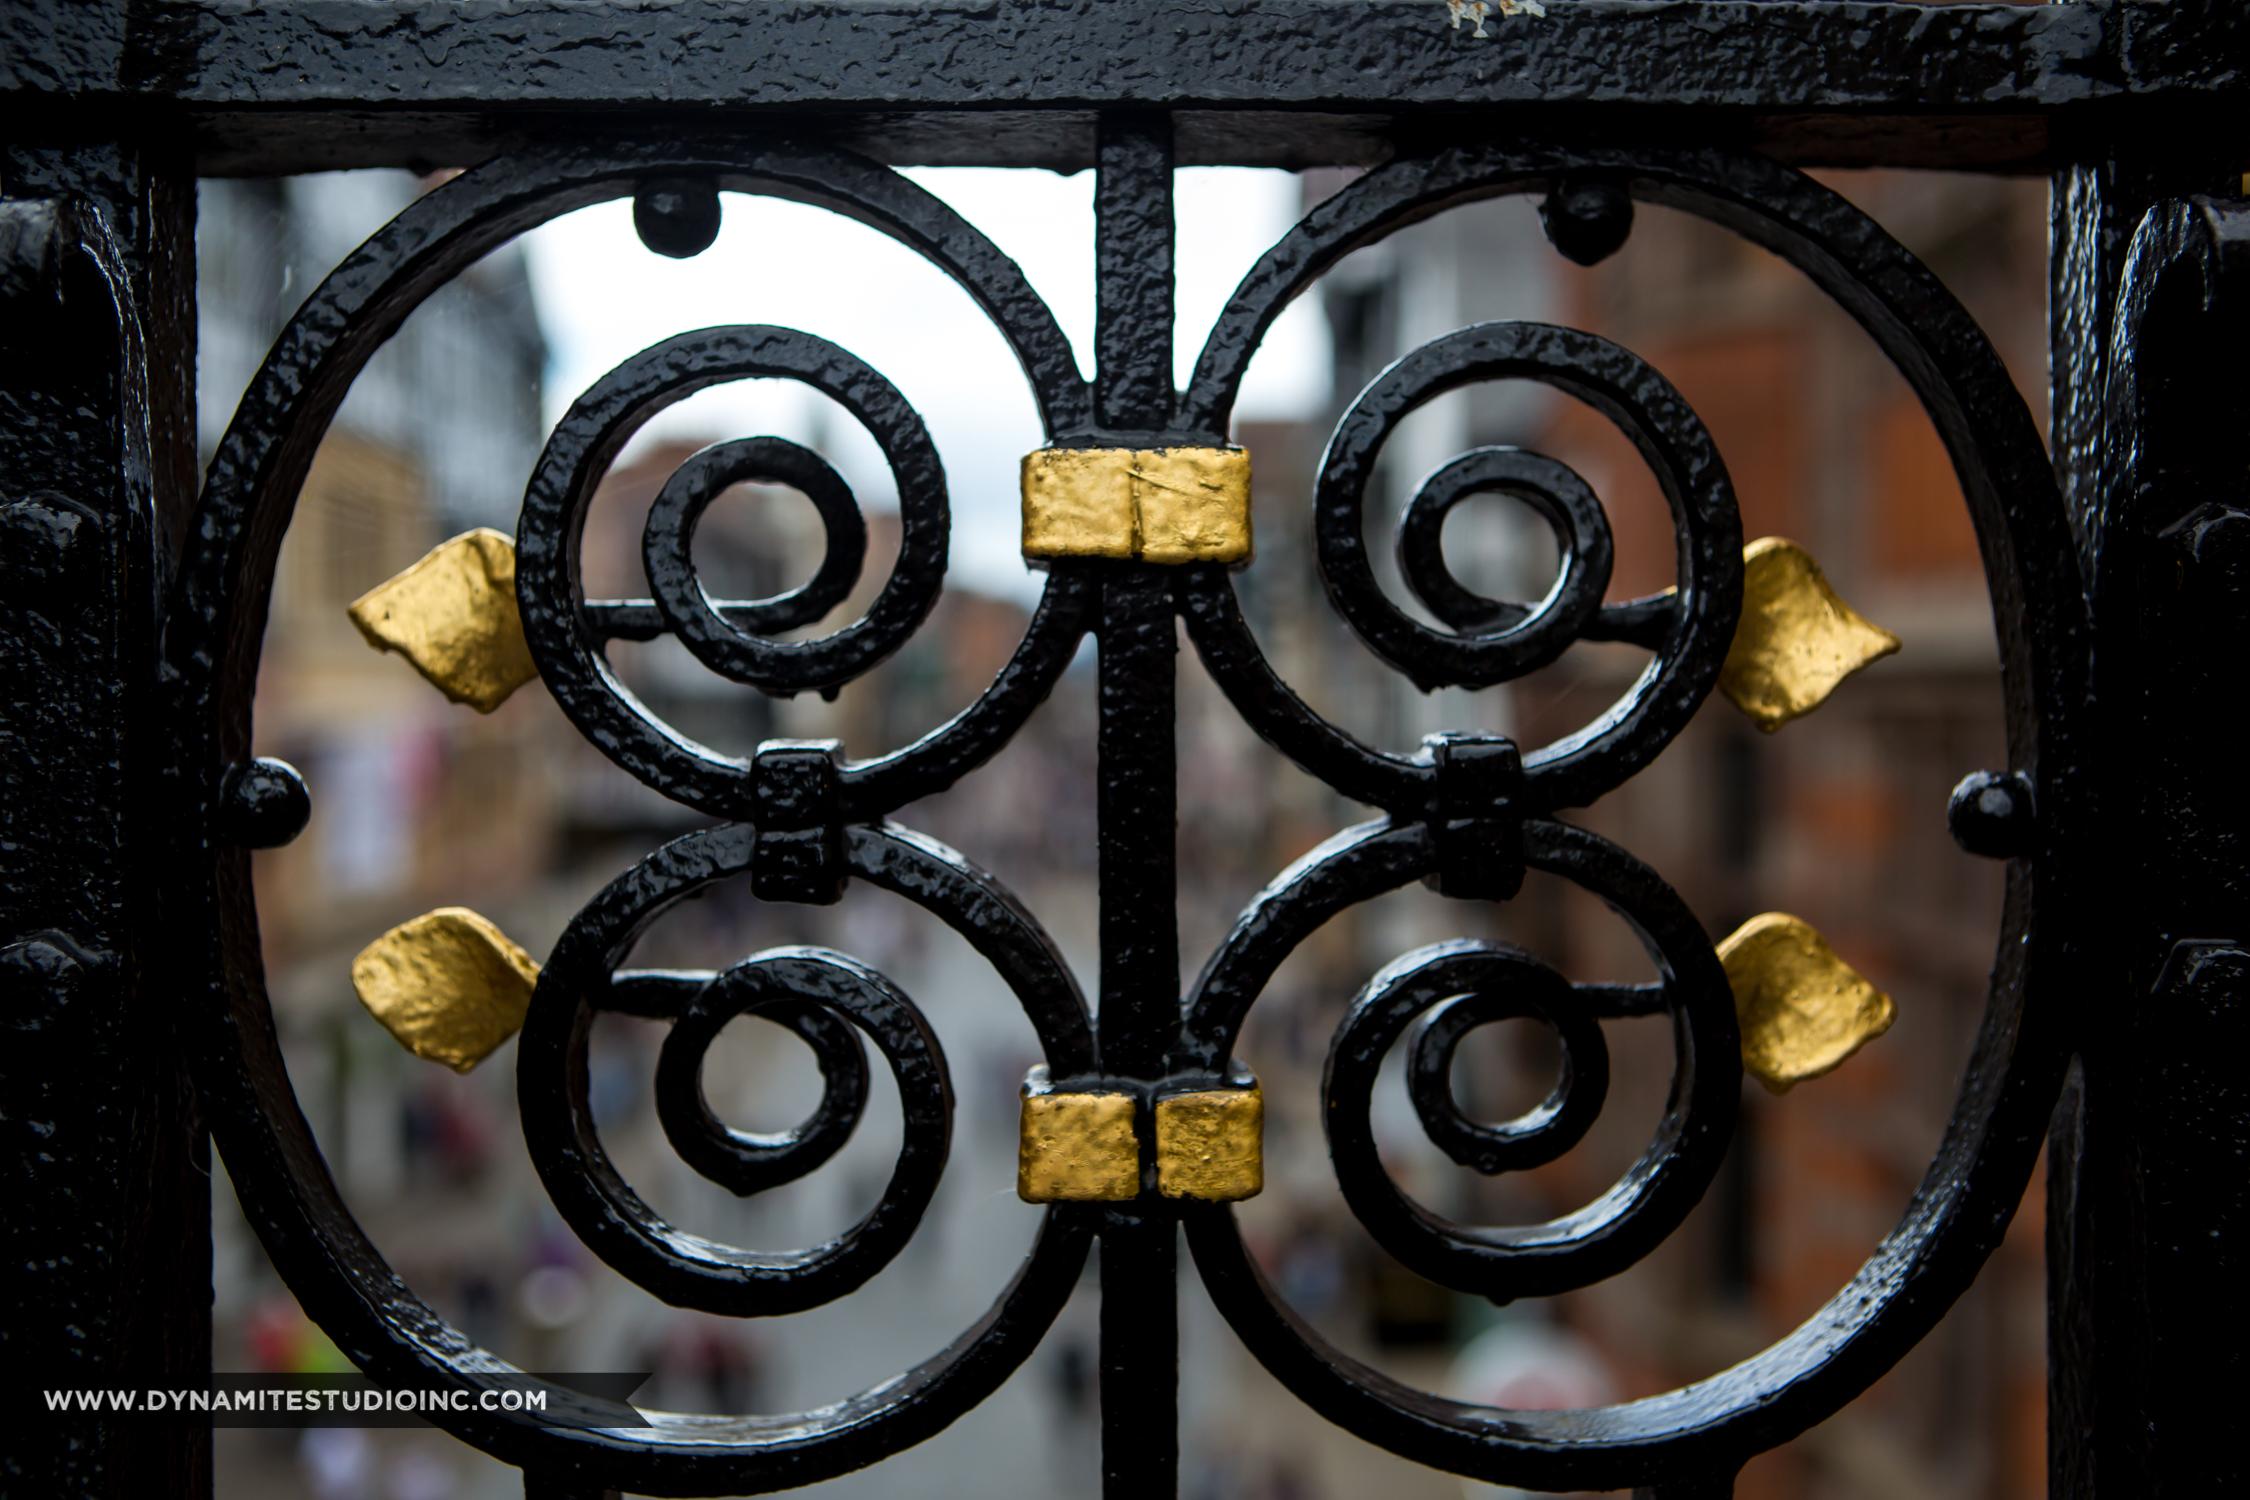 www.dynamitestudioinc.com-chester-england-travel-photography-orlando-9.jpg